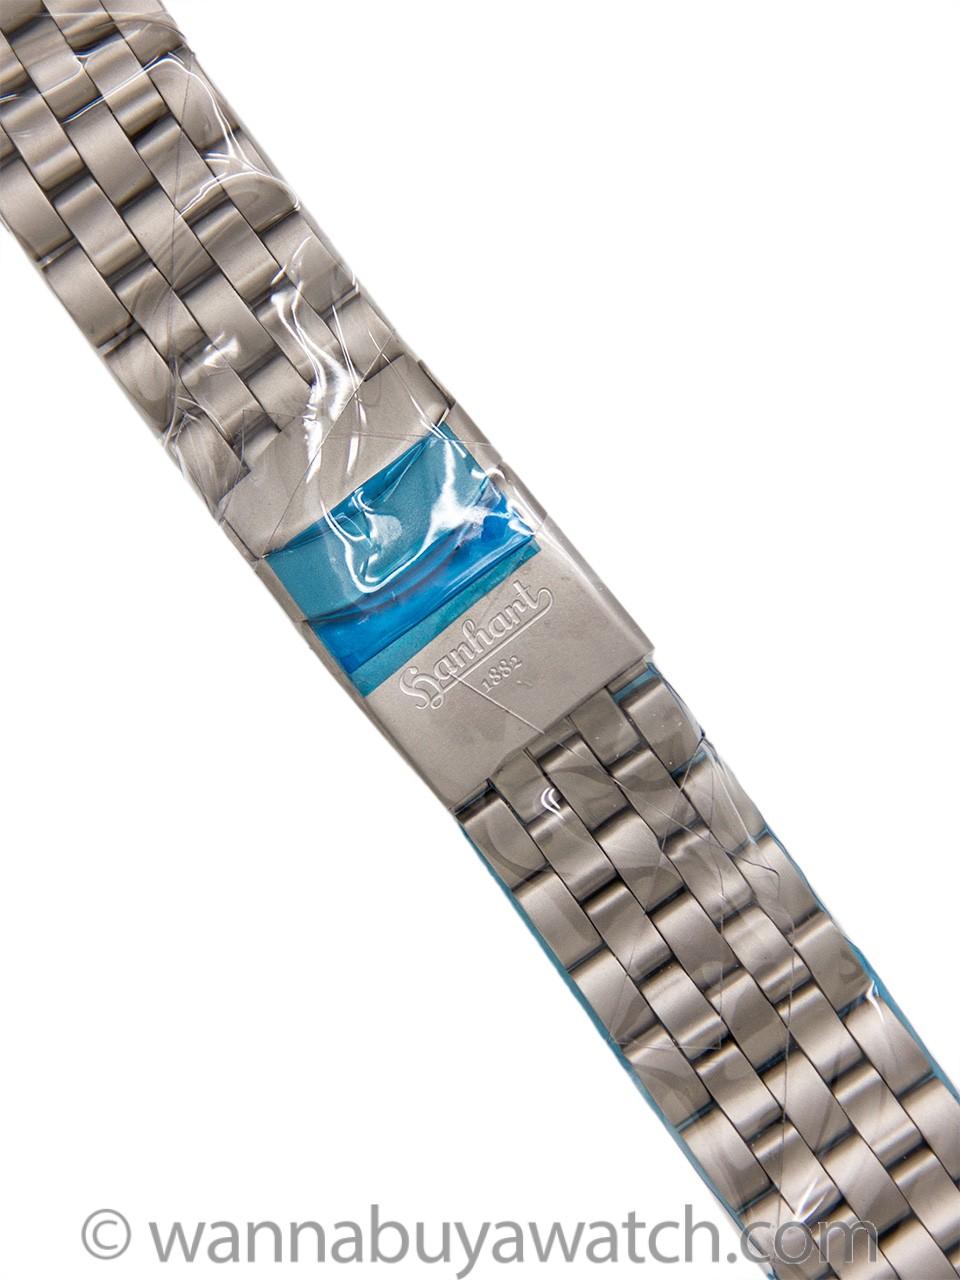 Hanhart Tachy Tele Strap & Bracelet circa 2016 B & P